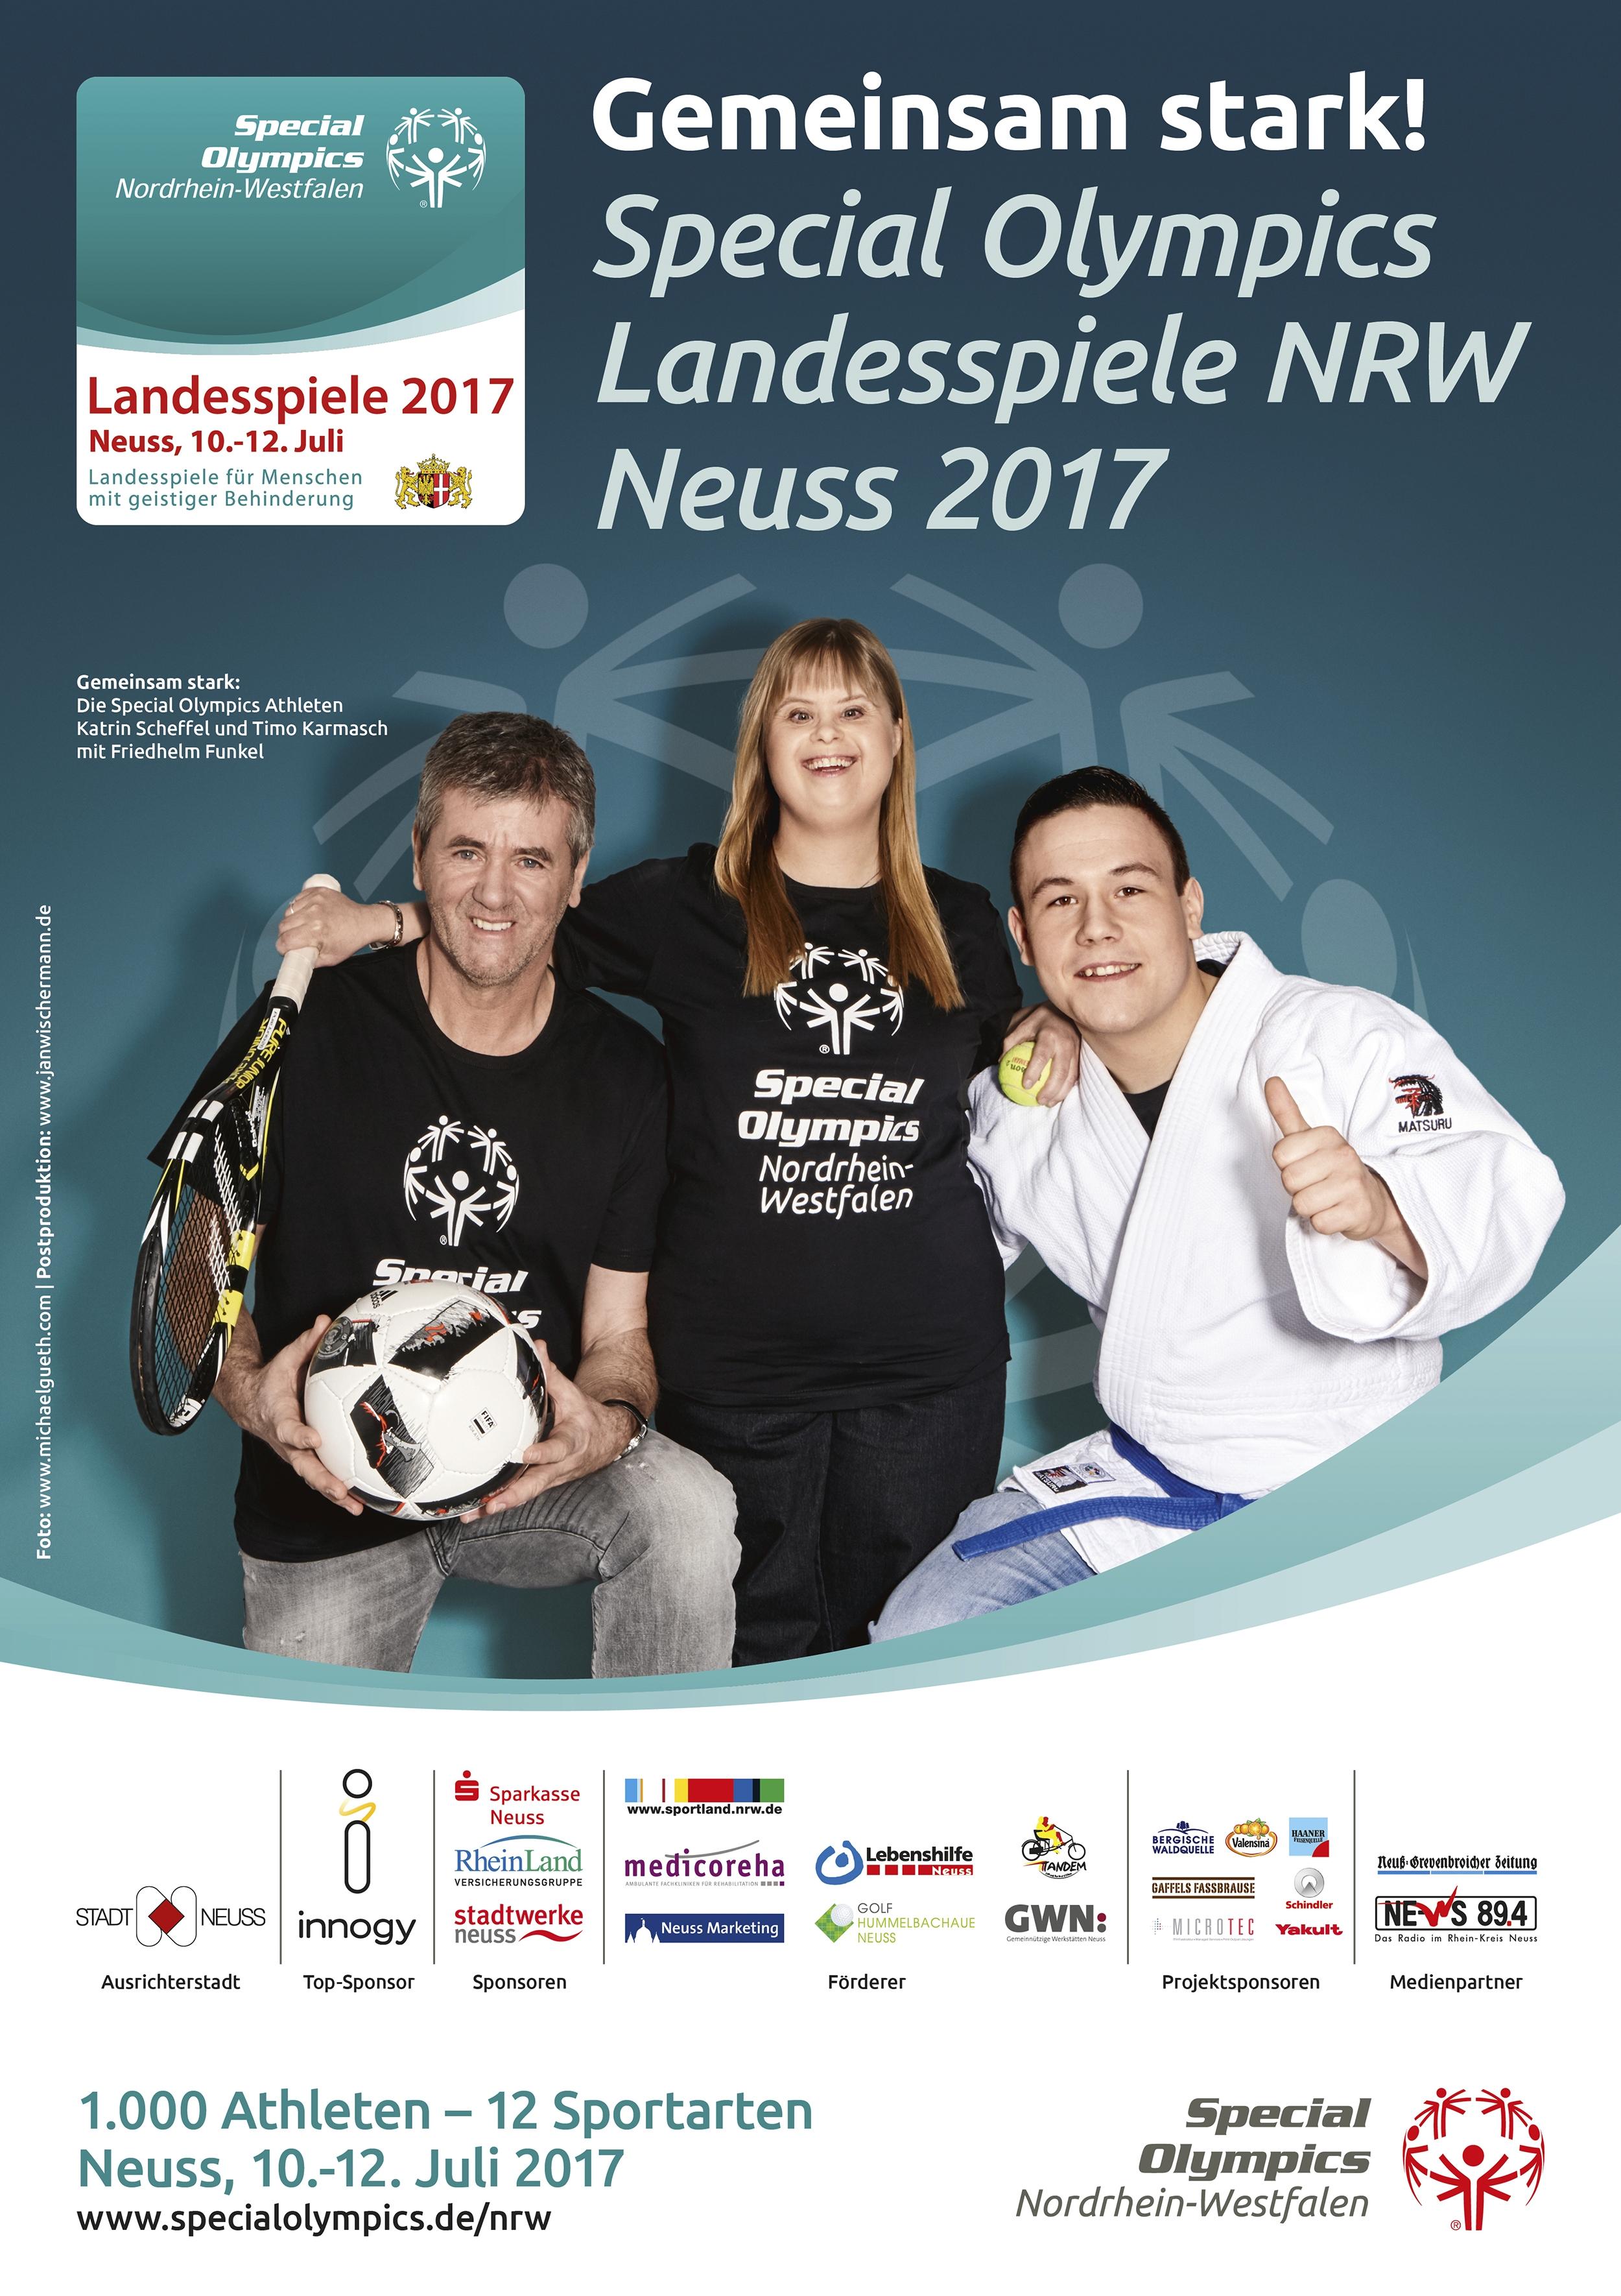 Special Olympics Plakat